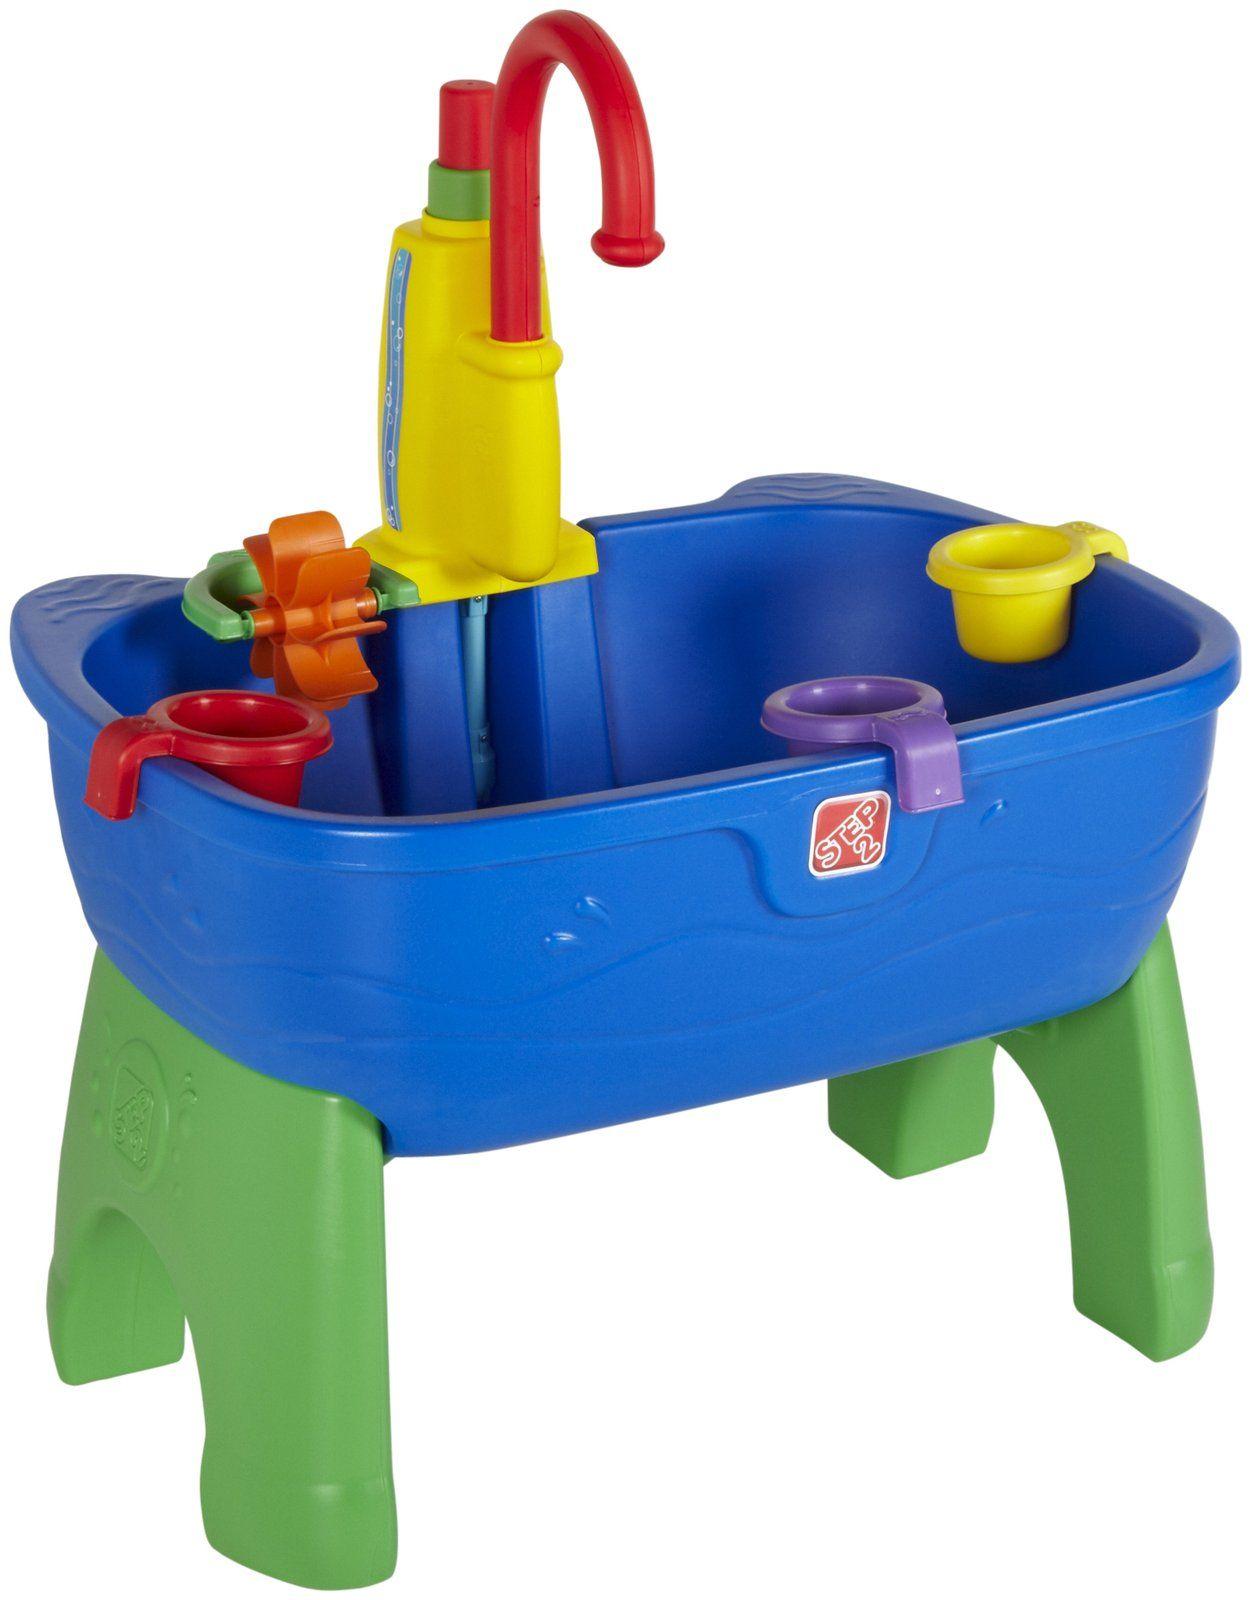 Step 2 Fun Flow Play Sink - Free Shipping | Kids | Pinterest | Flow ...